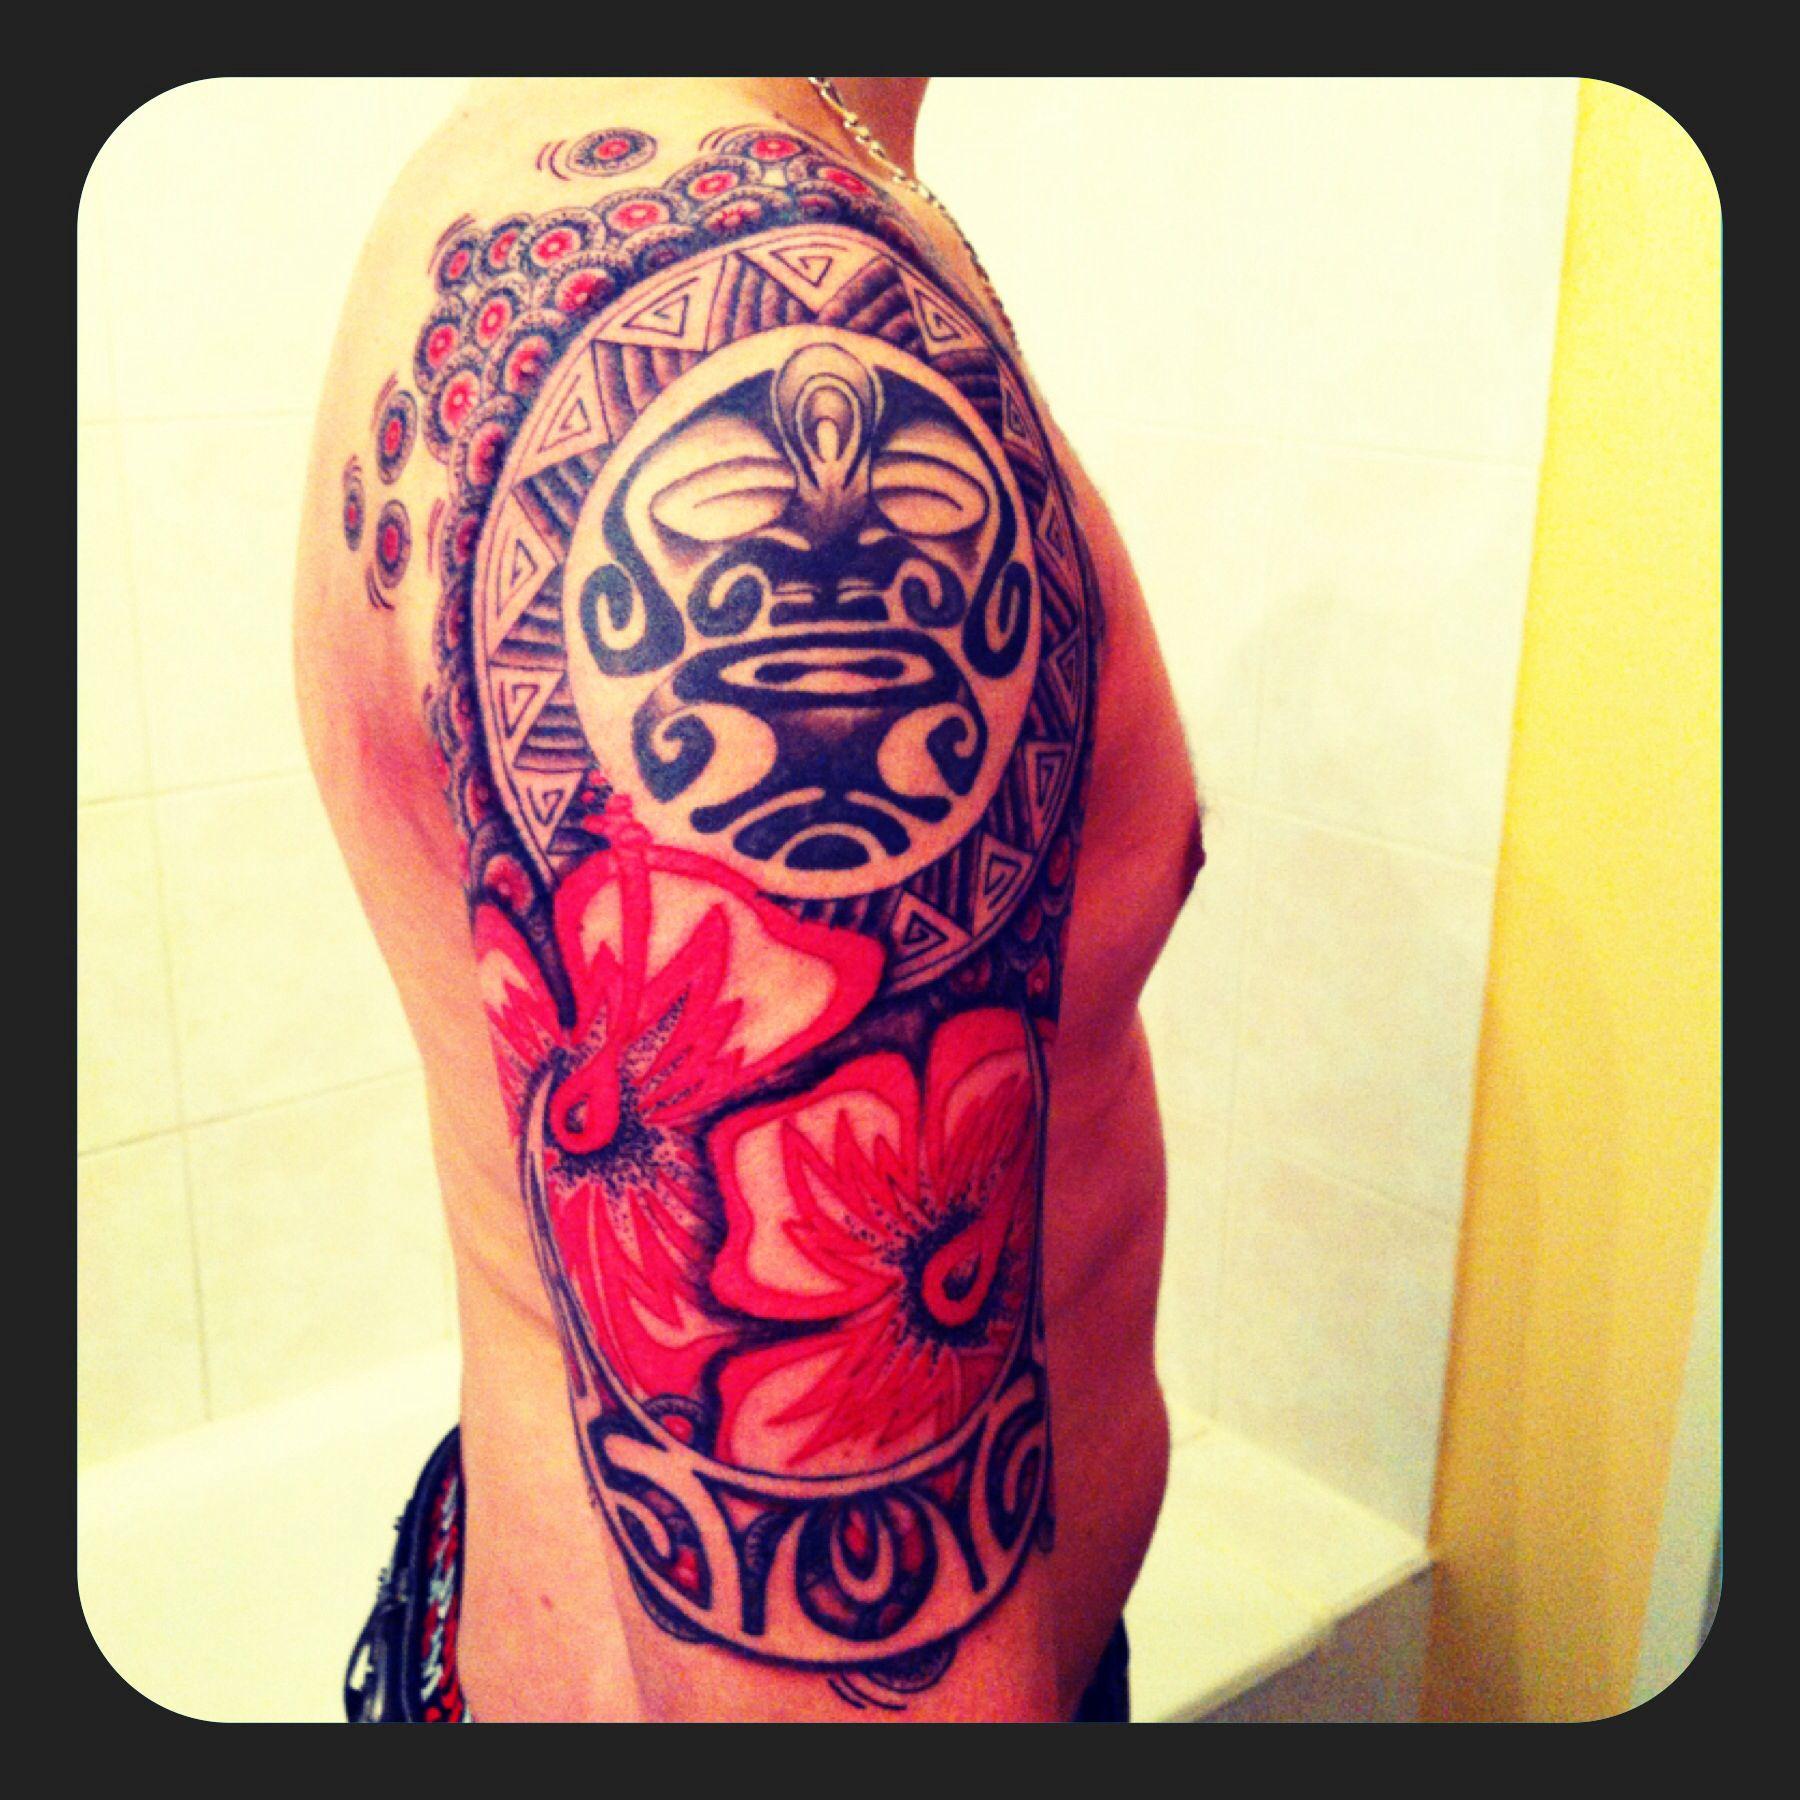 #Fred_naud_tattoo